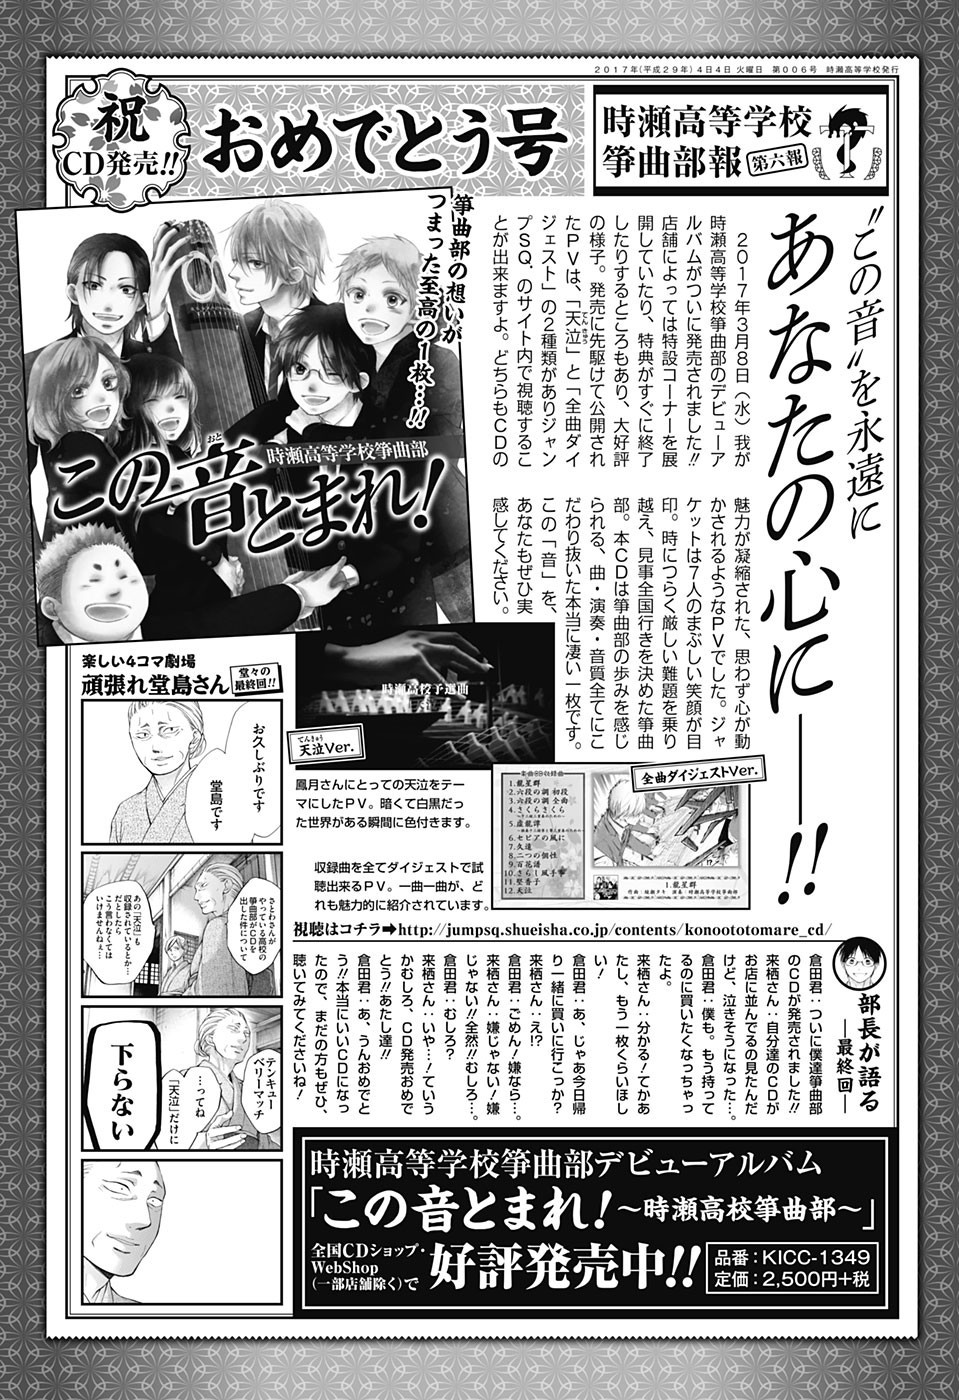 Kono Oto Tomare! - Chapter 57 - Page 1